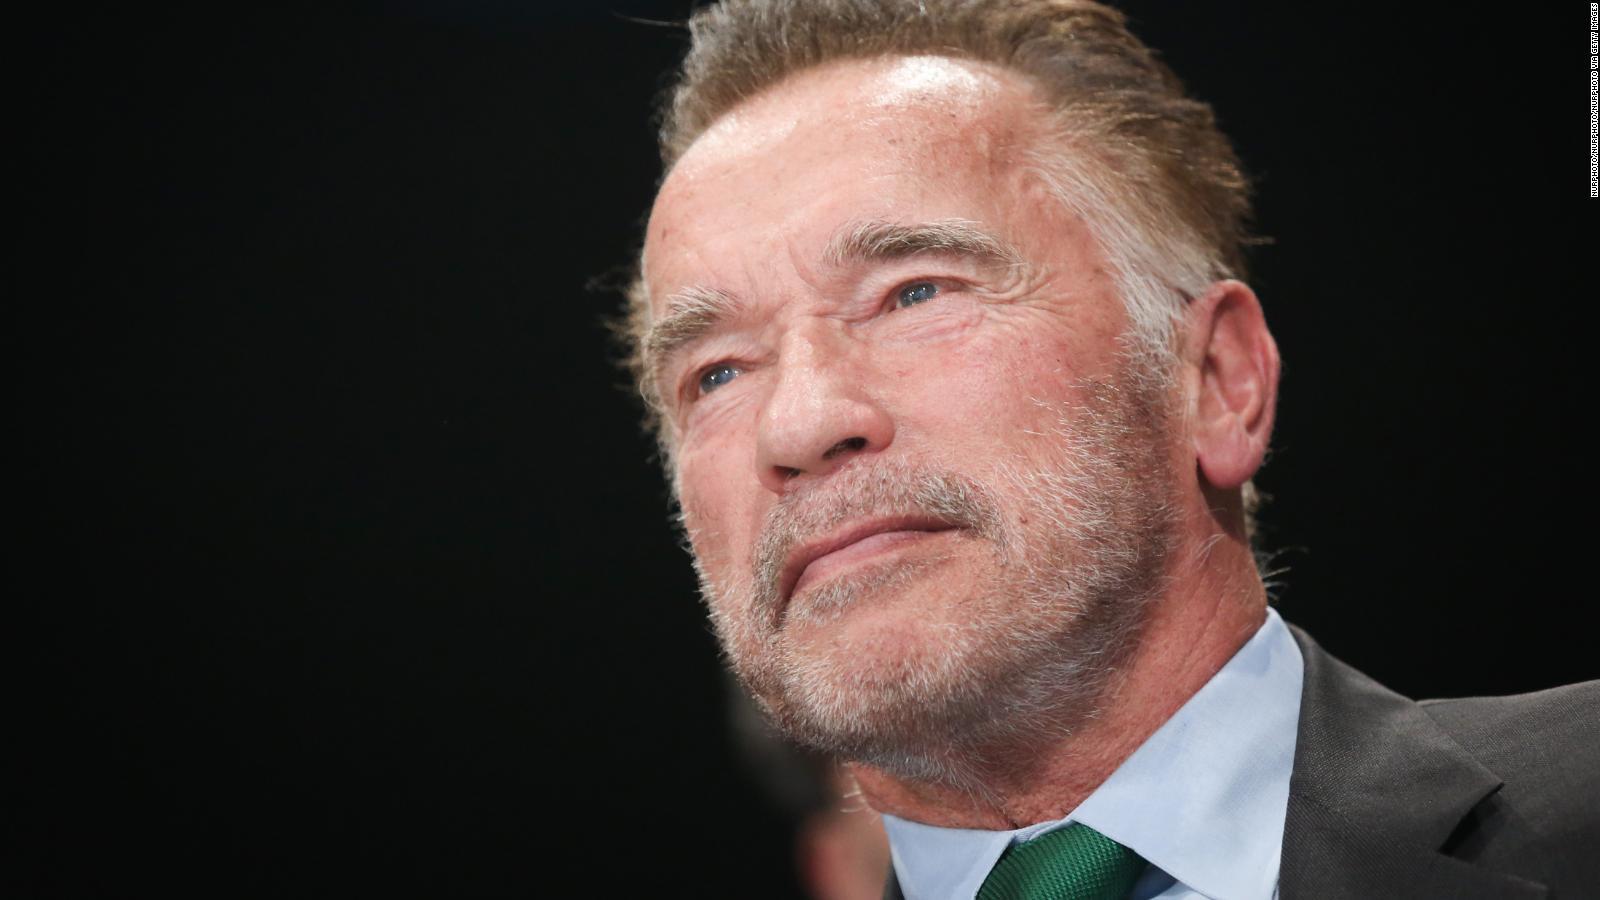 Schwarzenegger: Trump wrong on climate change